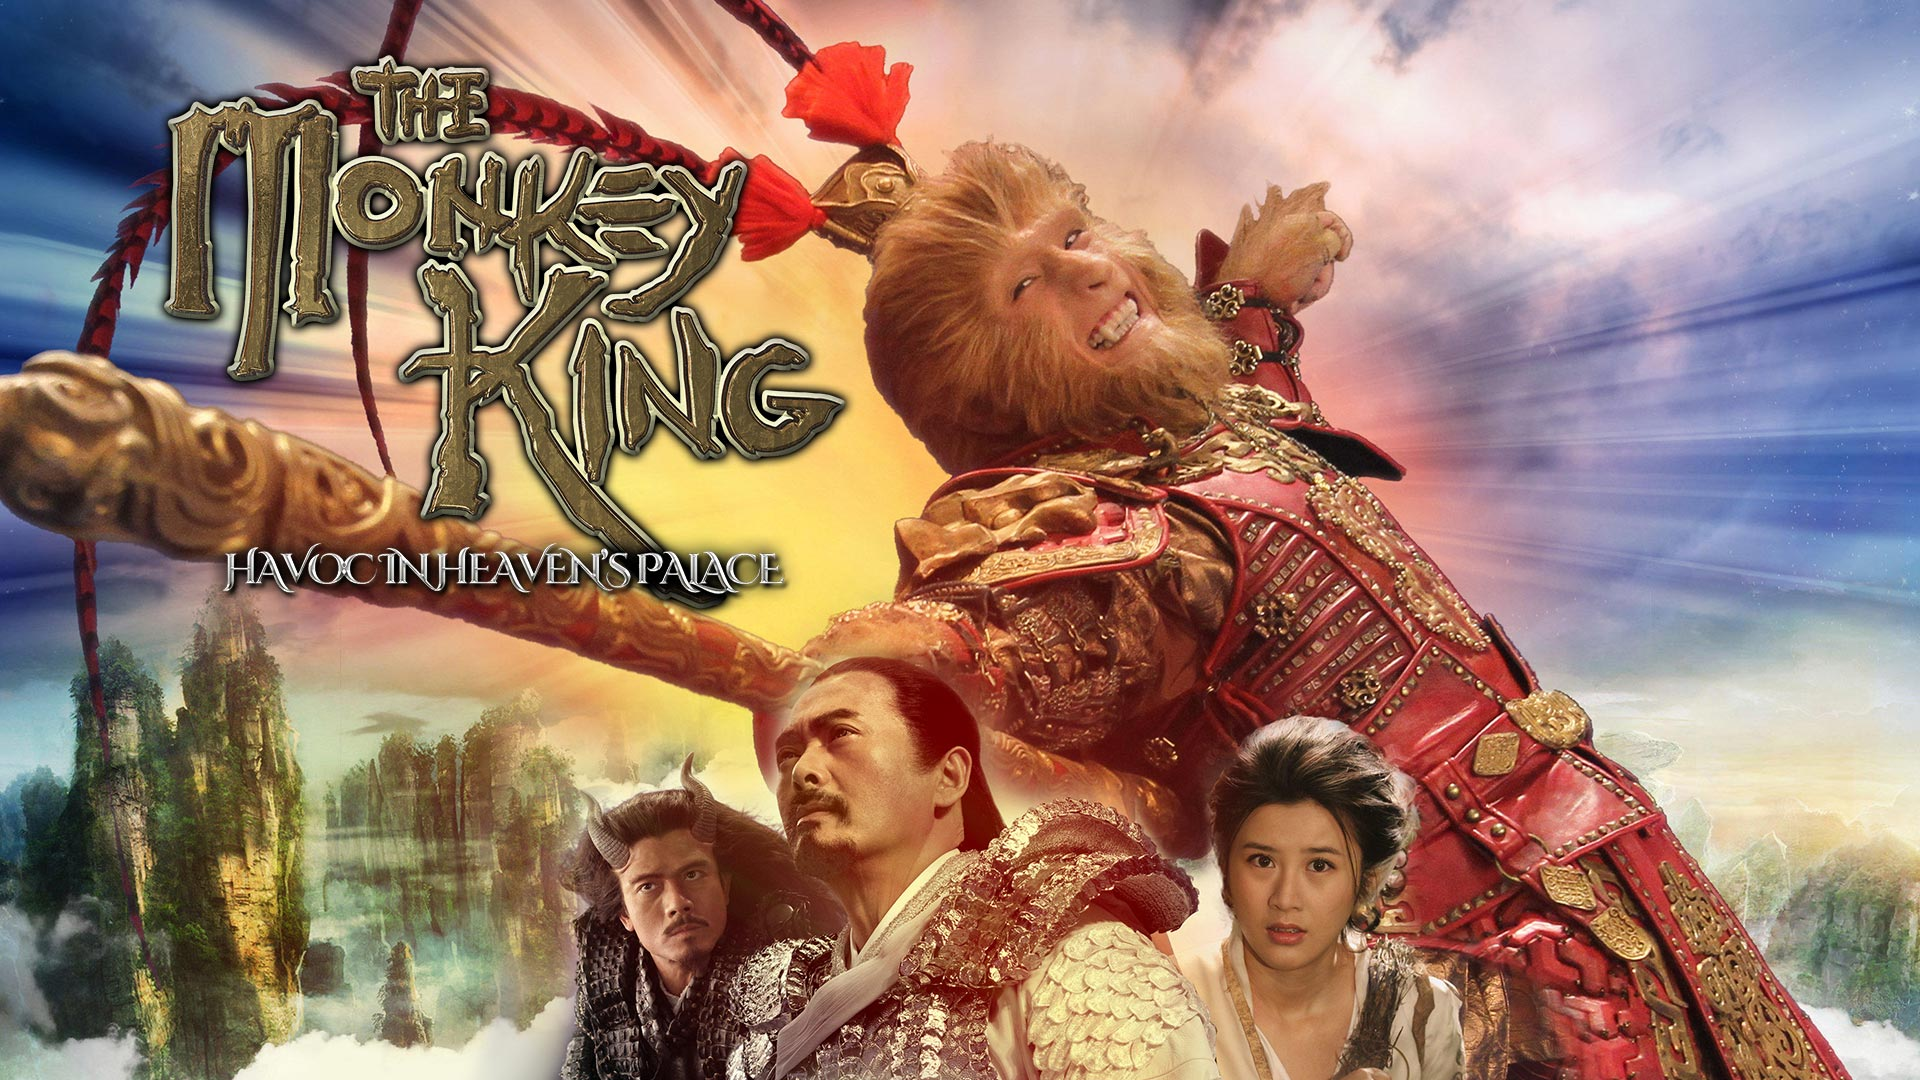 The Monkey King: Havoc In Heaven's Palace (English Subtitled)